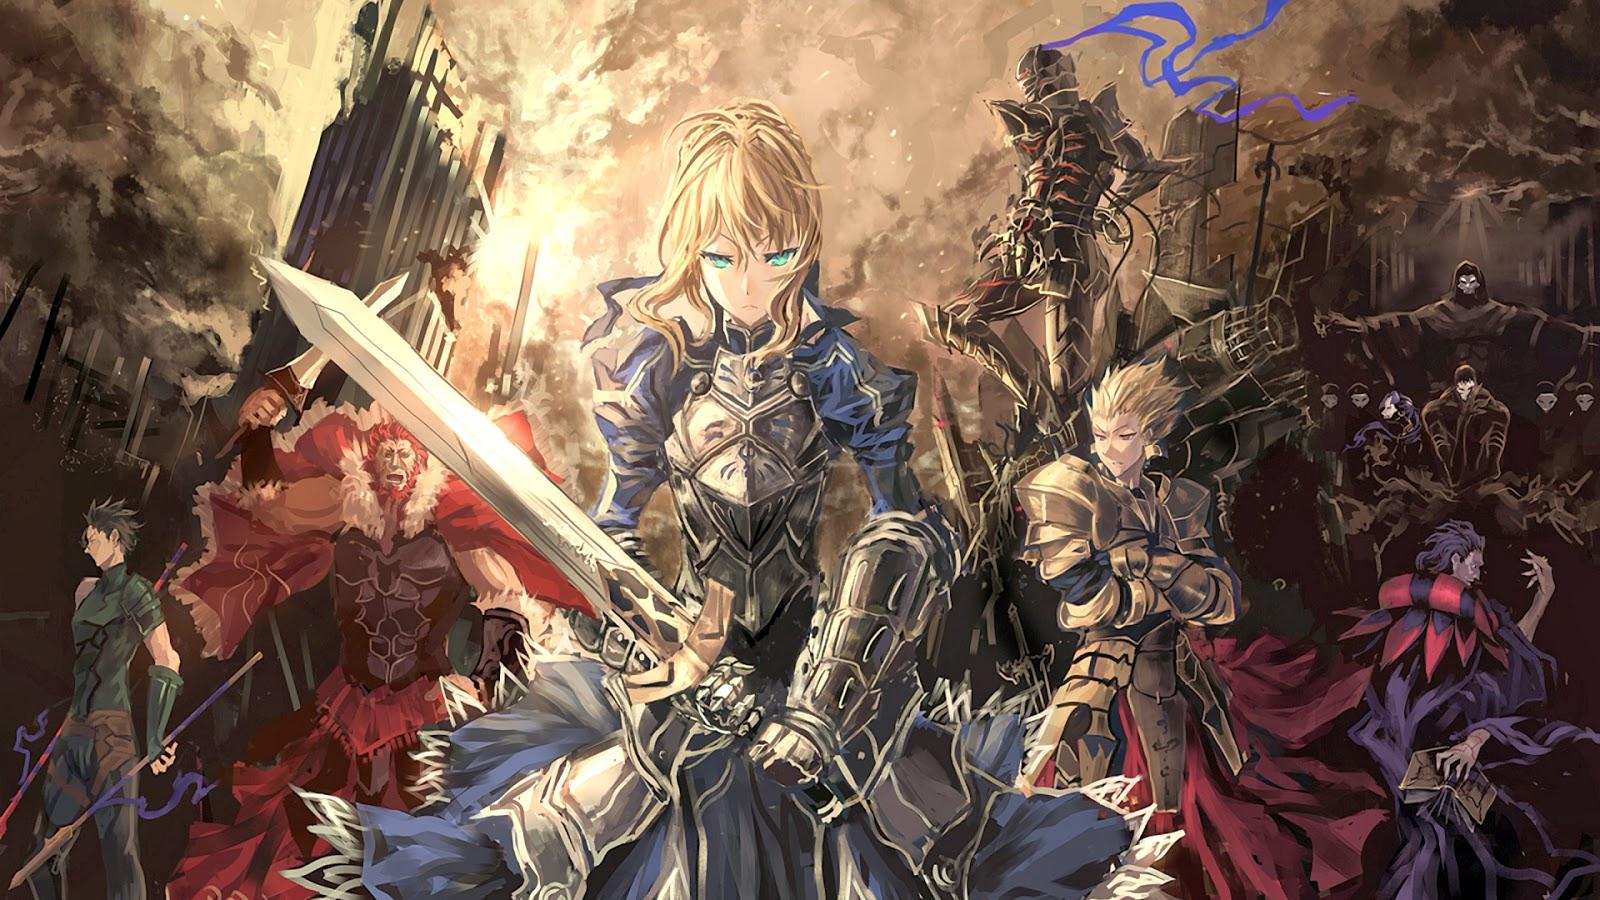 fate stay night wallpaper anime saber gilgames armor knight sword 1600x900